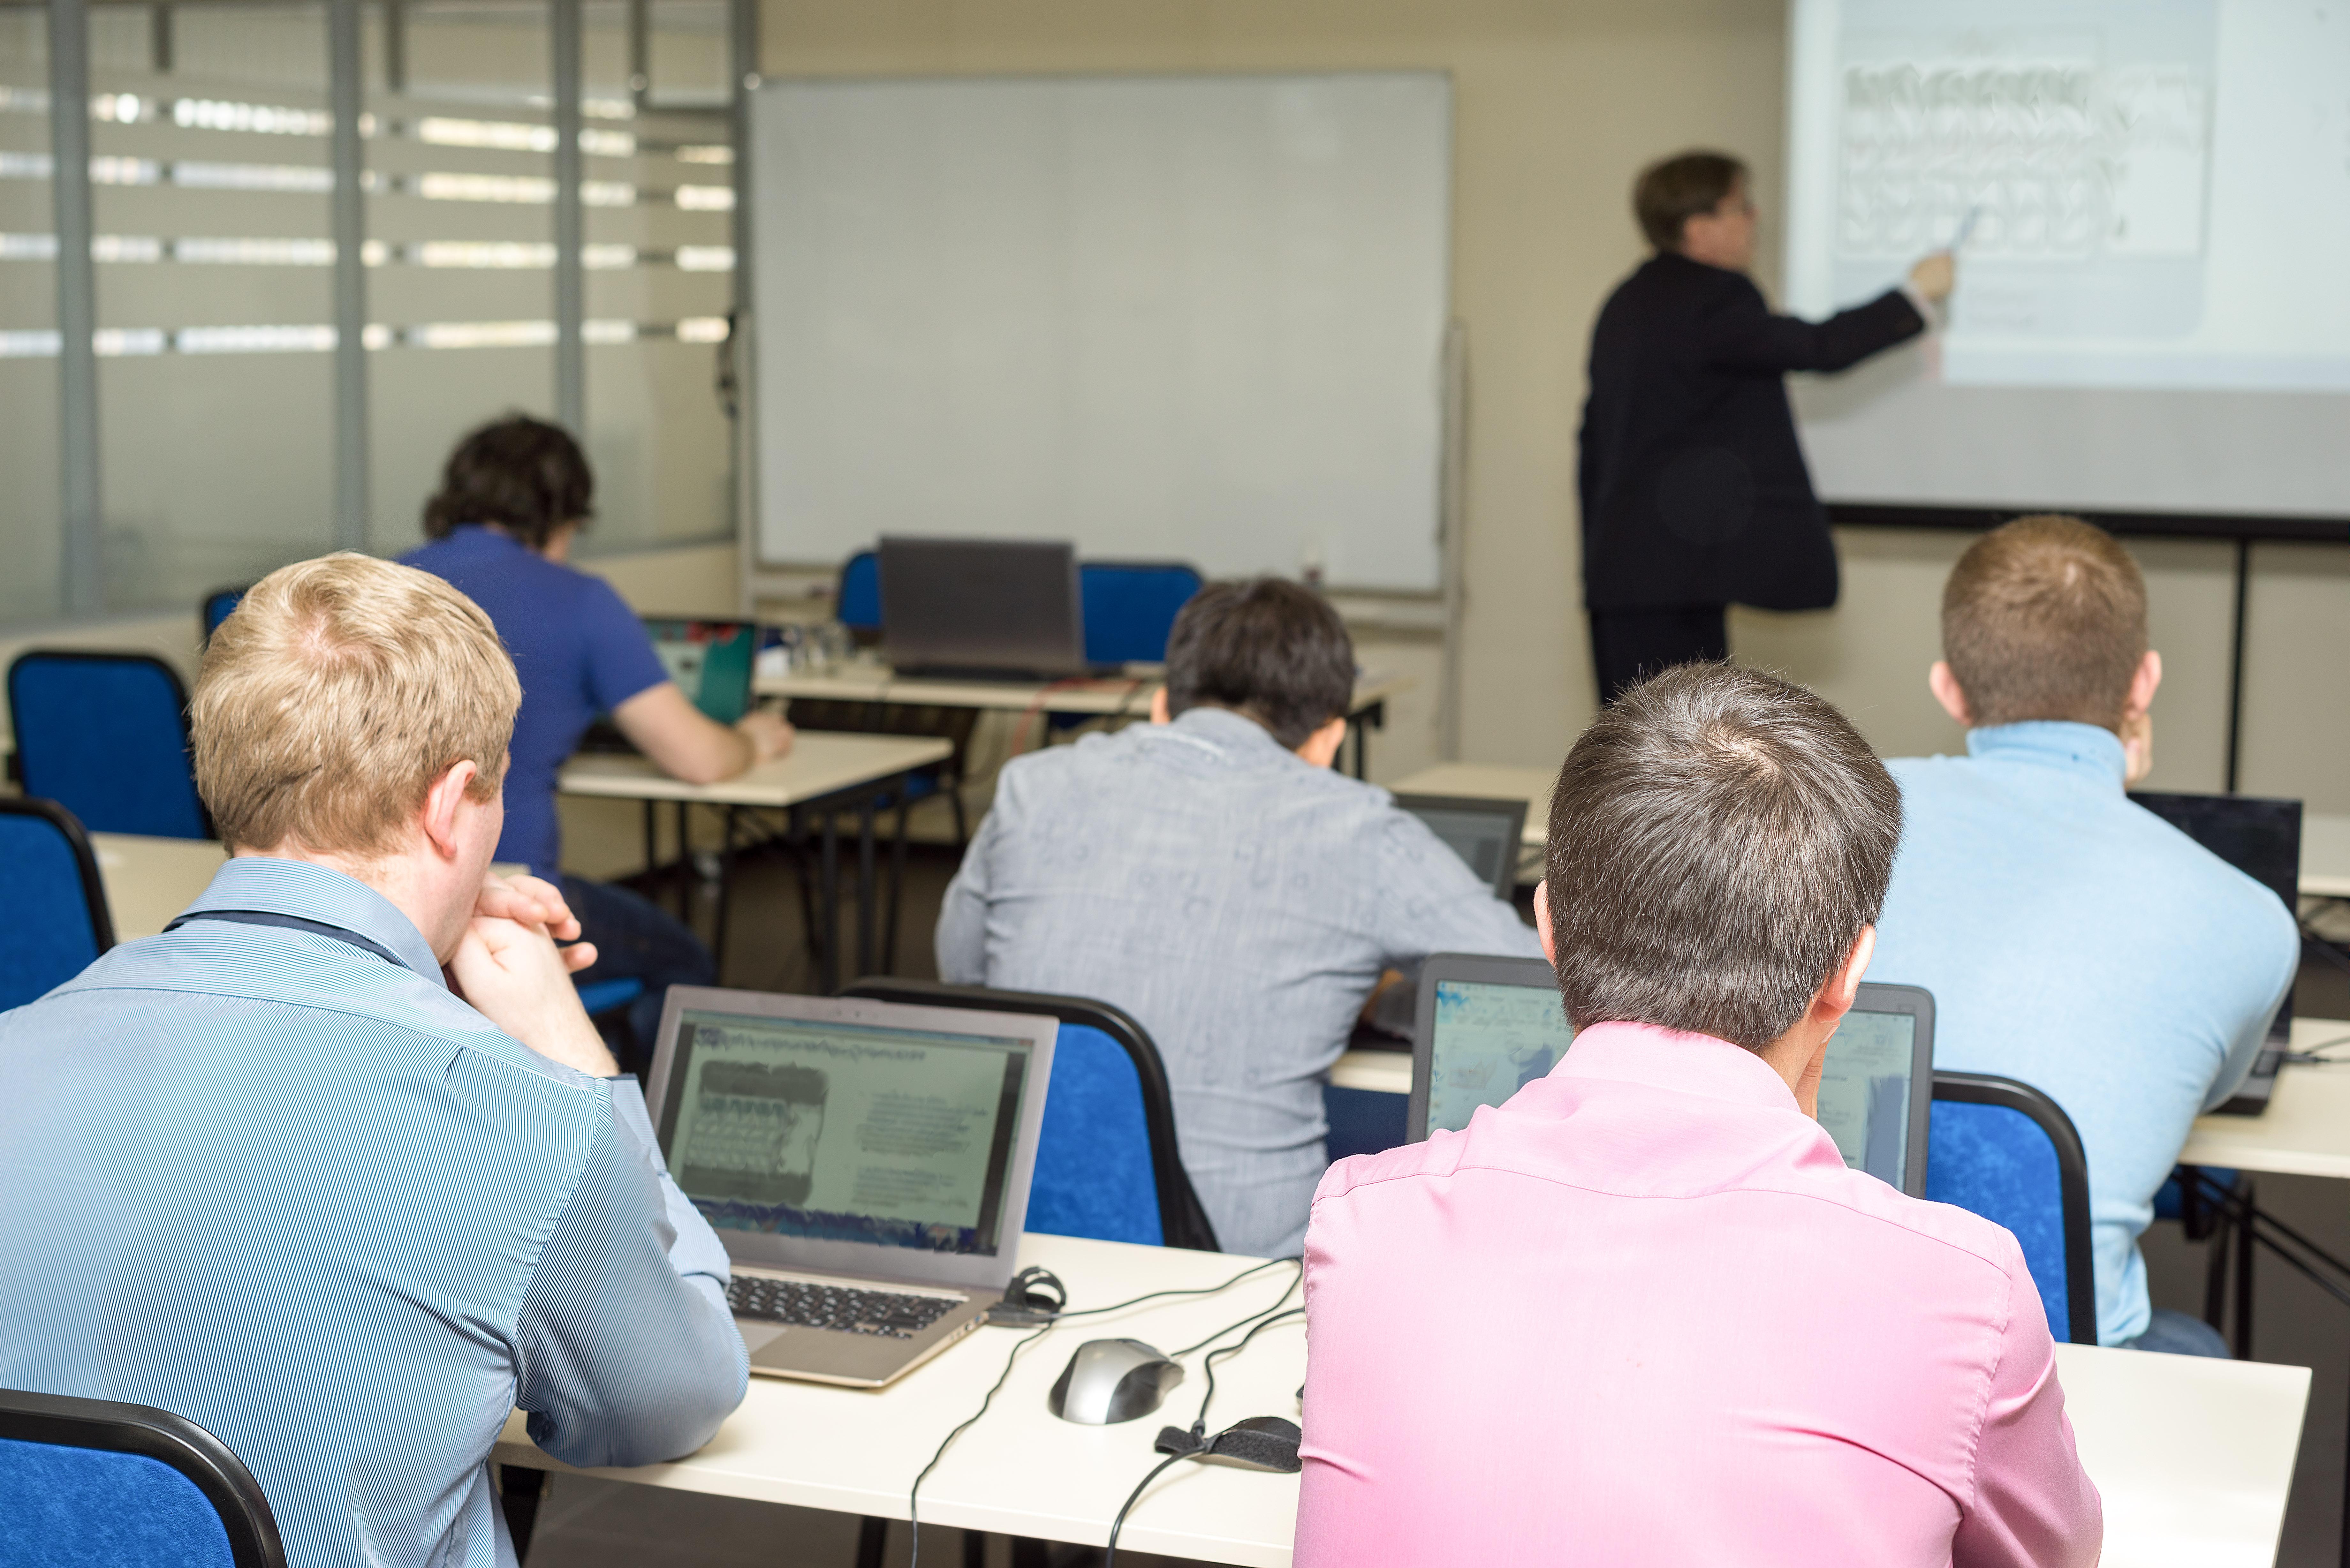 User training breeding softwar